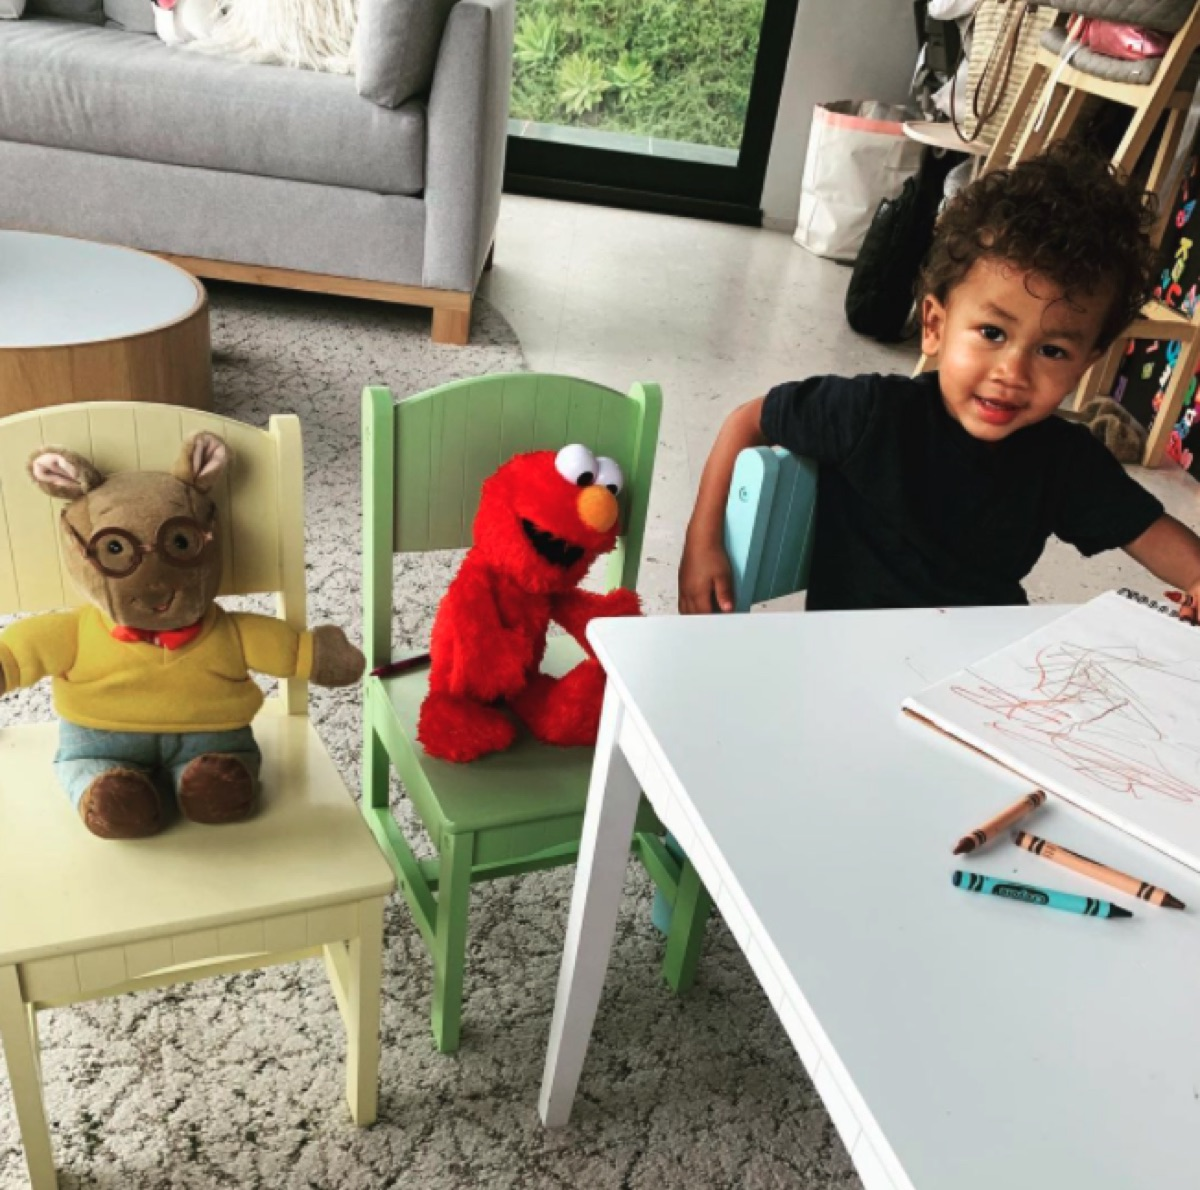 Miles Stephens with Elmo and Arthur toys